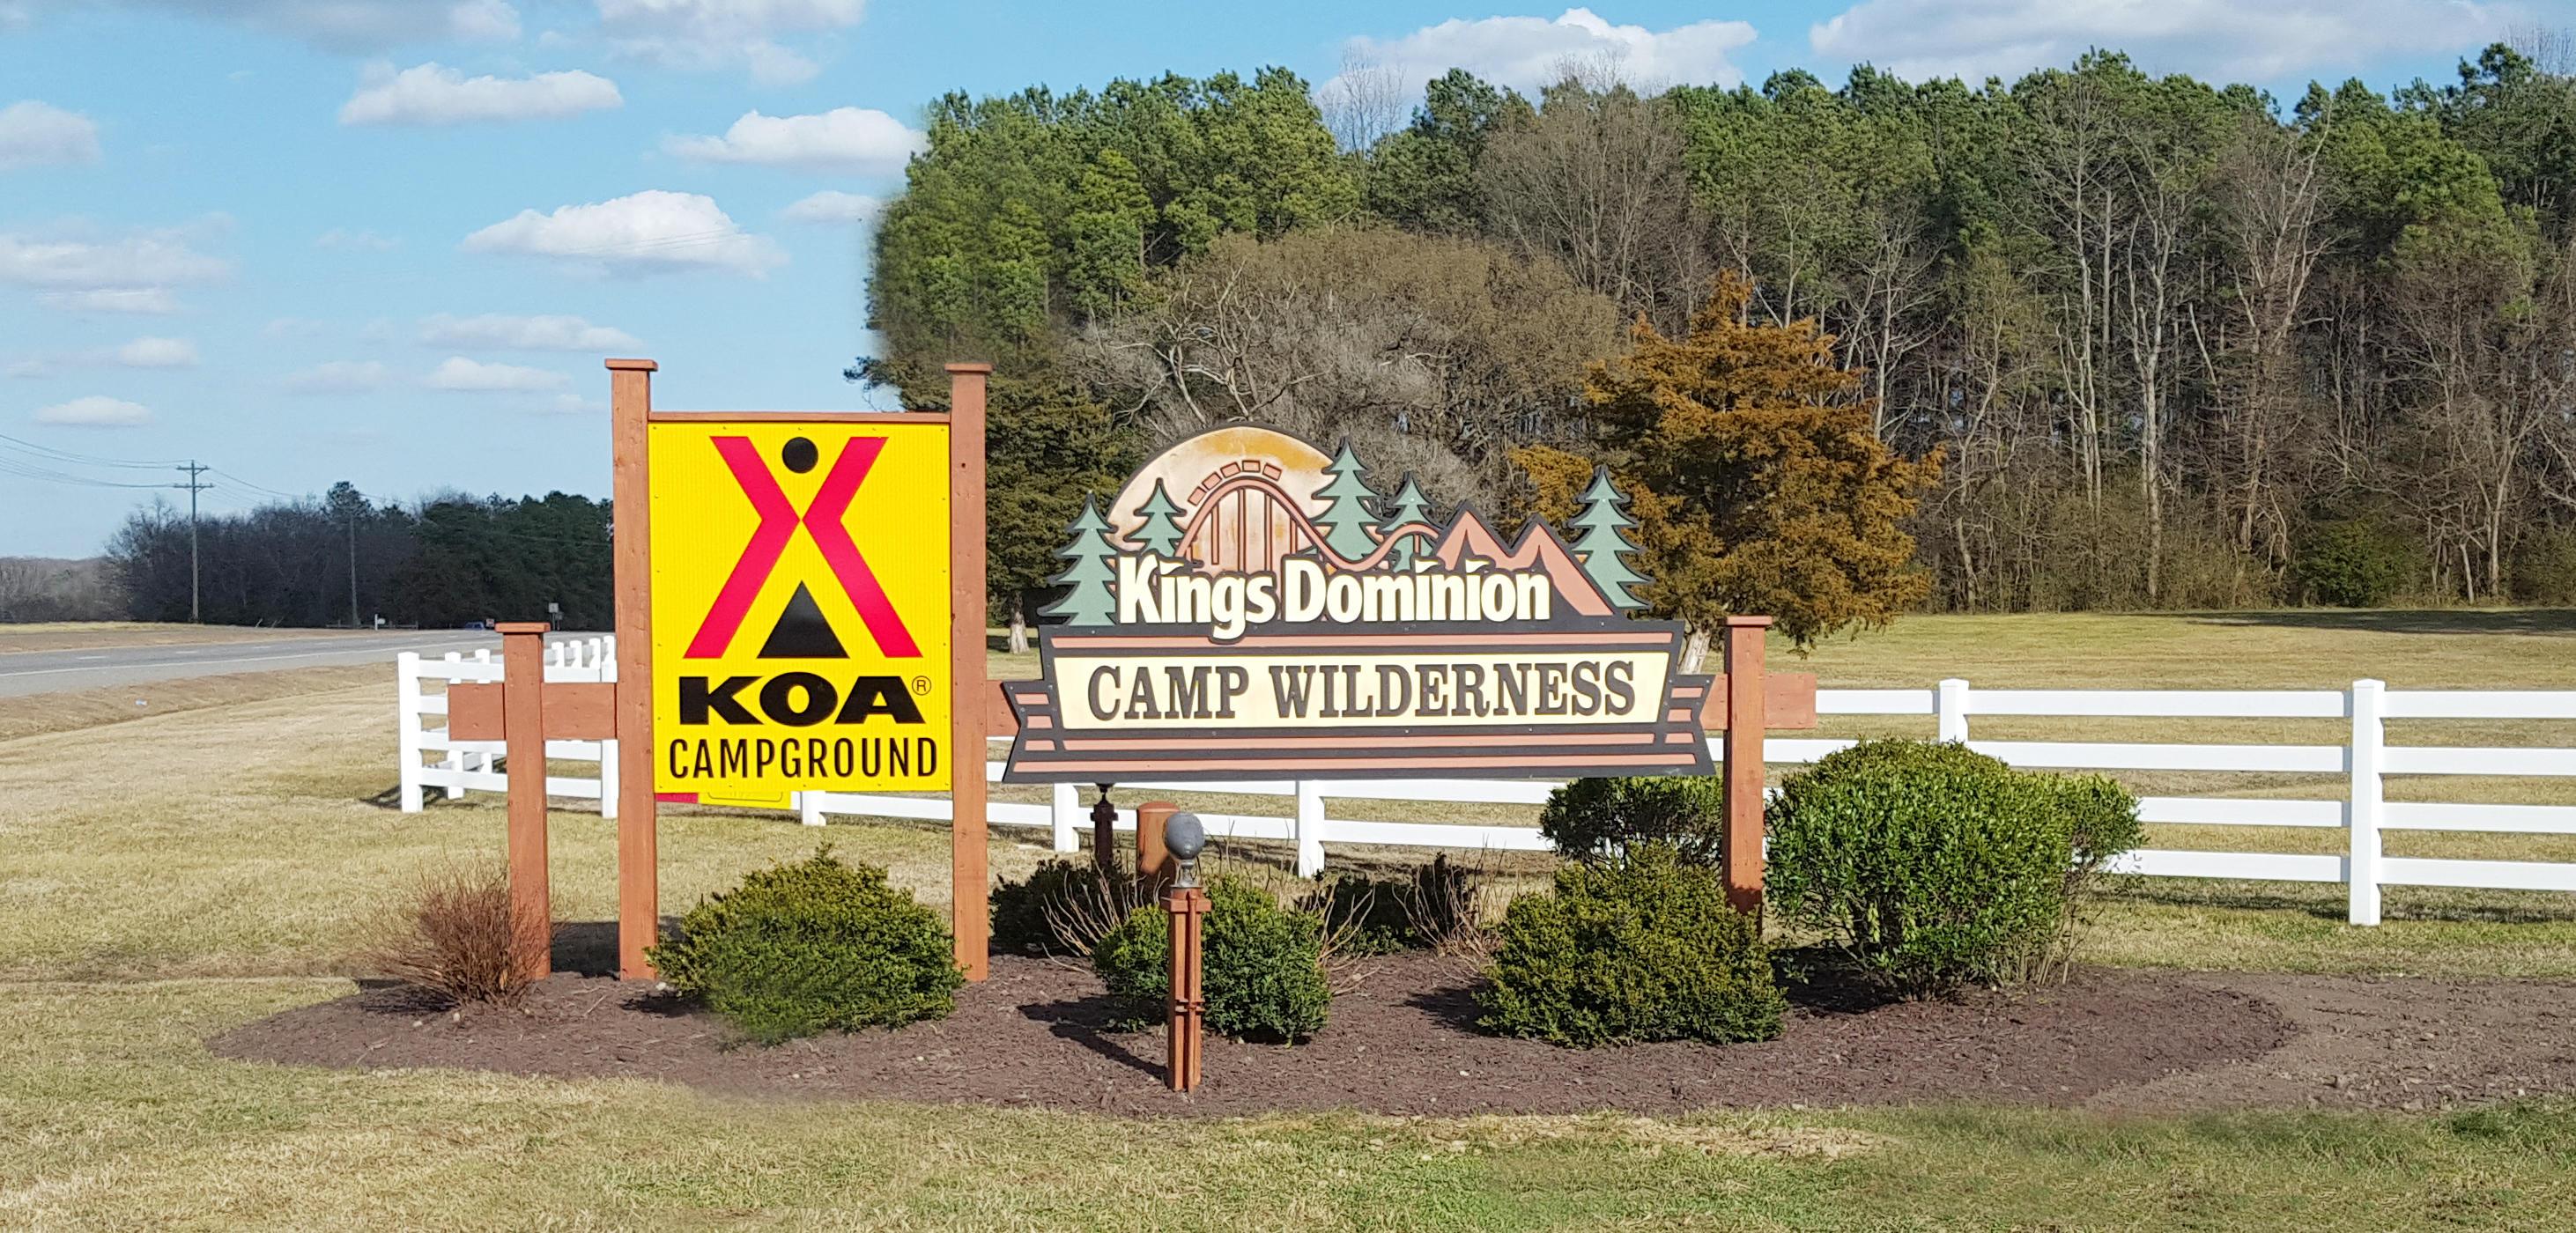 Richmond North / Kings Dominion KOA